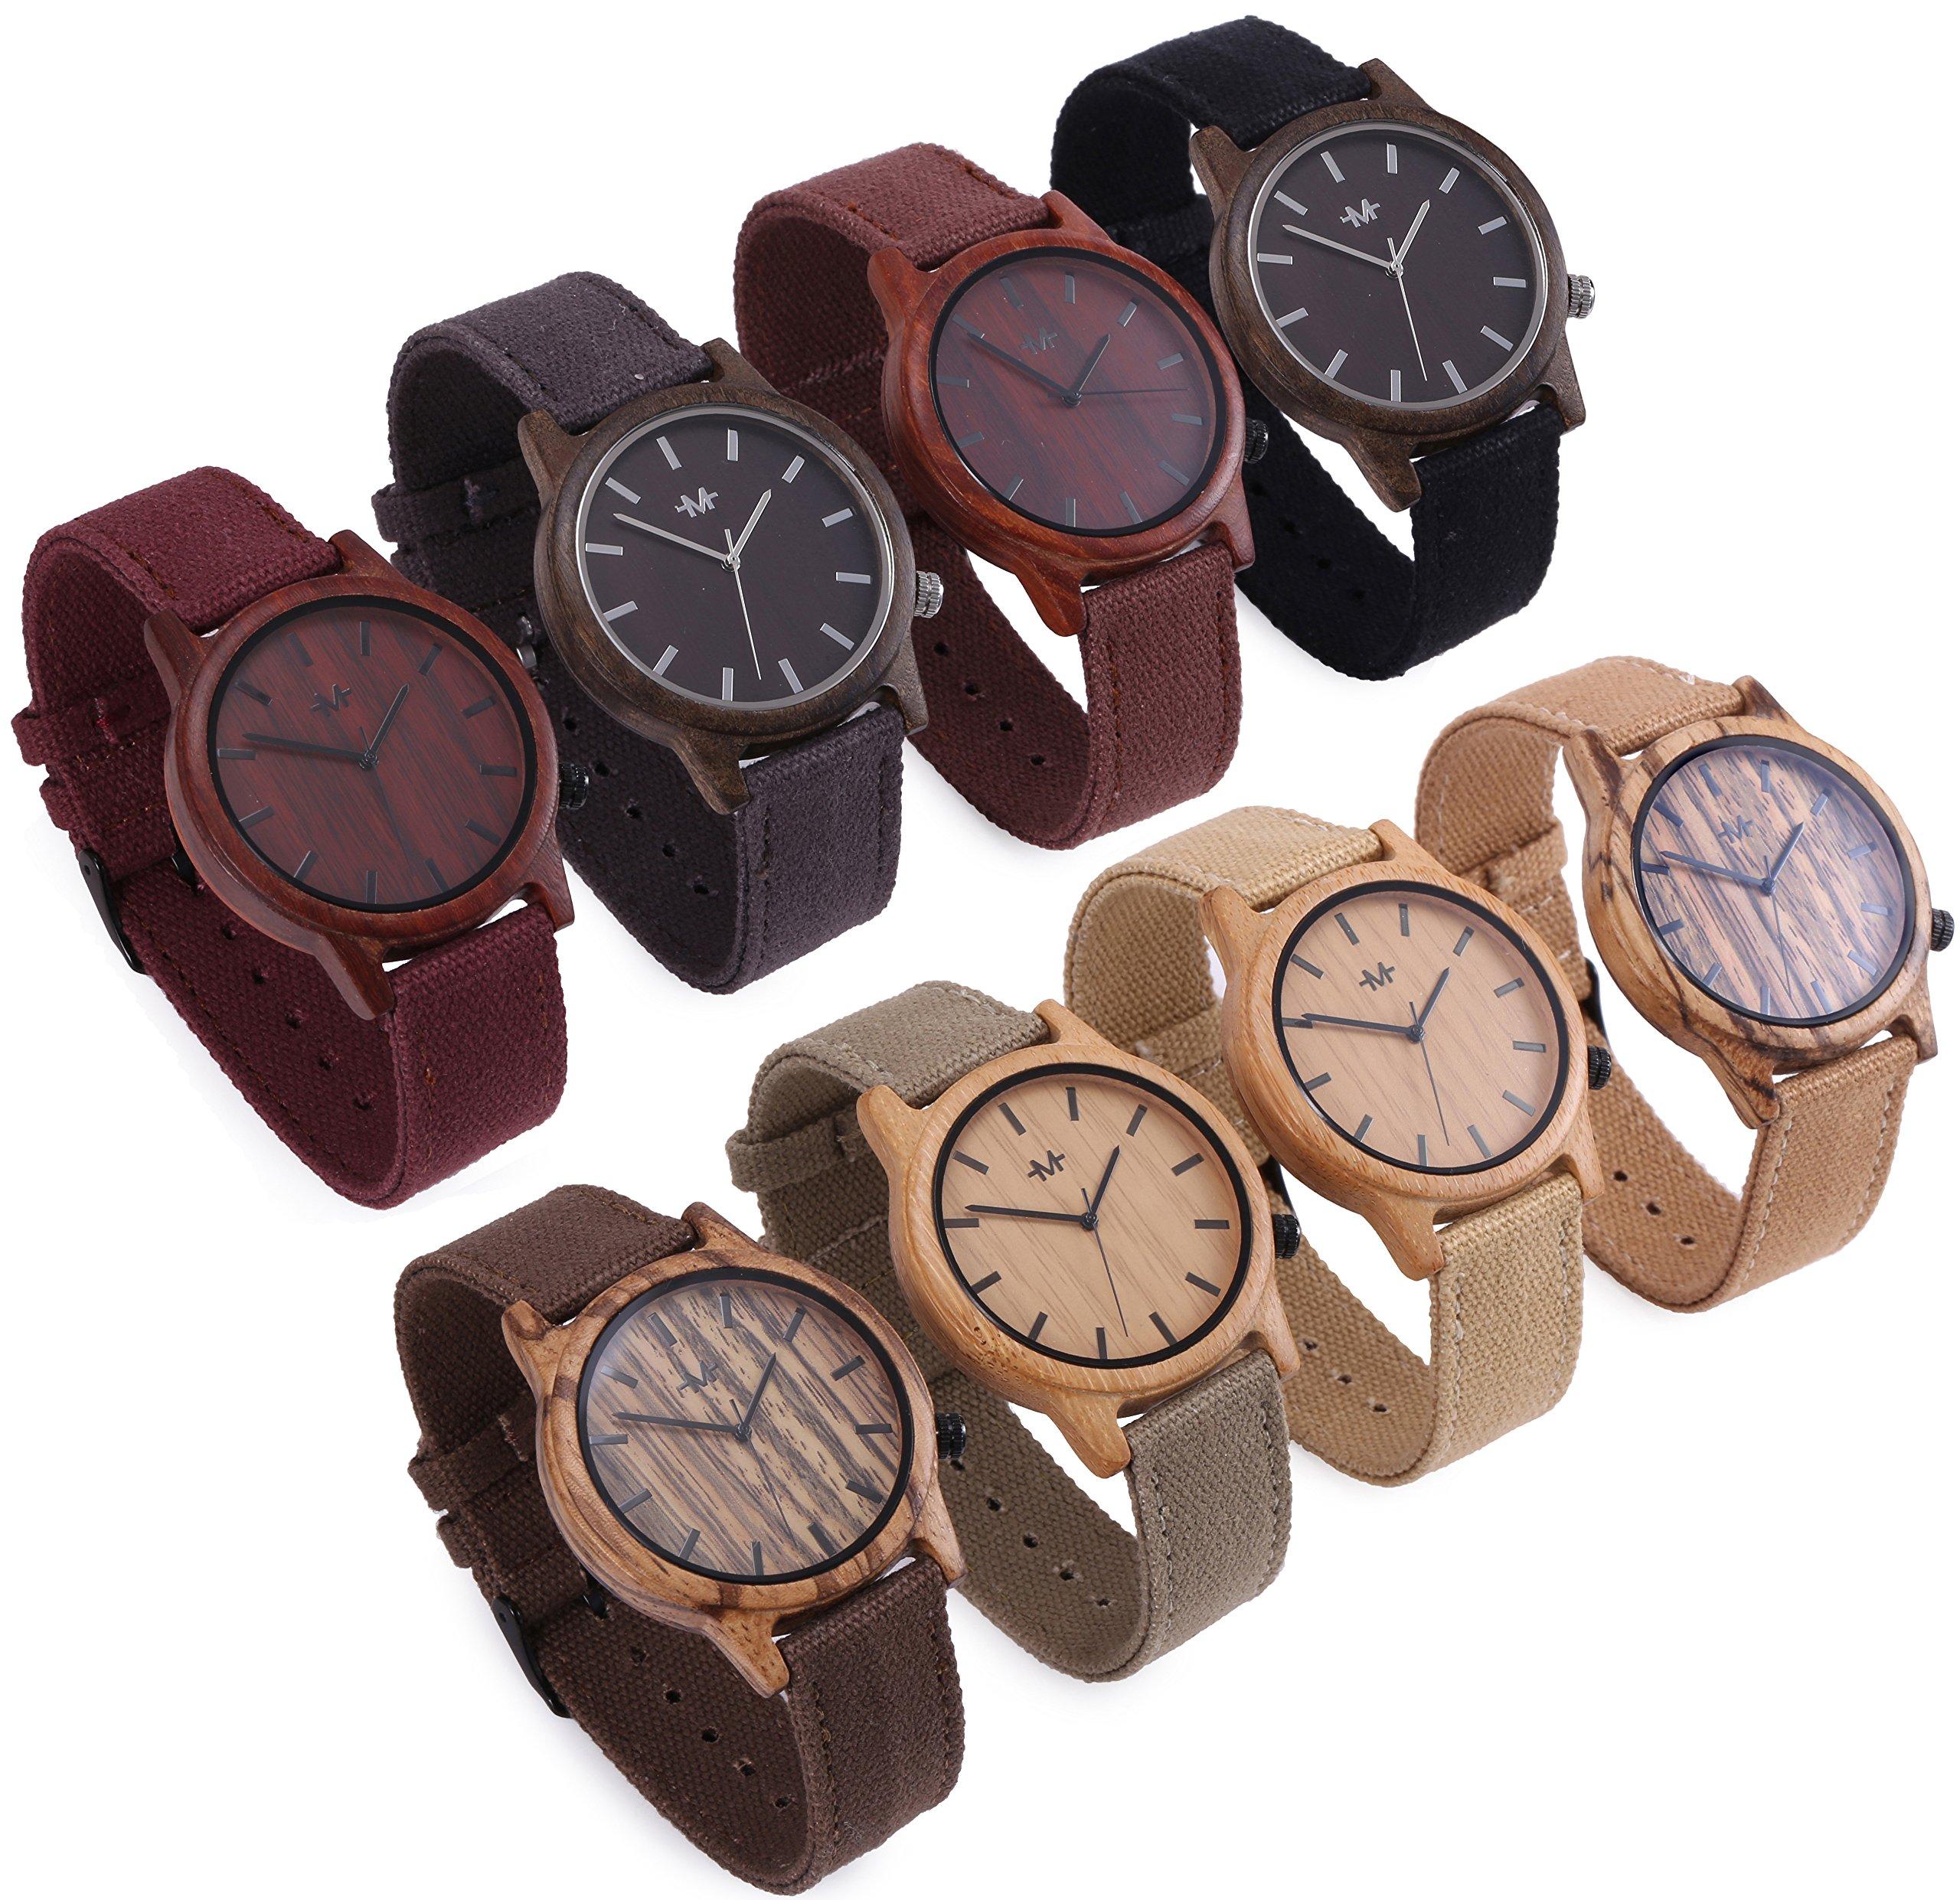 Marino Mens Wooden Watch - Wrist watches for Men - Dress Wood Watch (One Size, Khaki - Canvas Band) by Marino Avenue (Image #2)